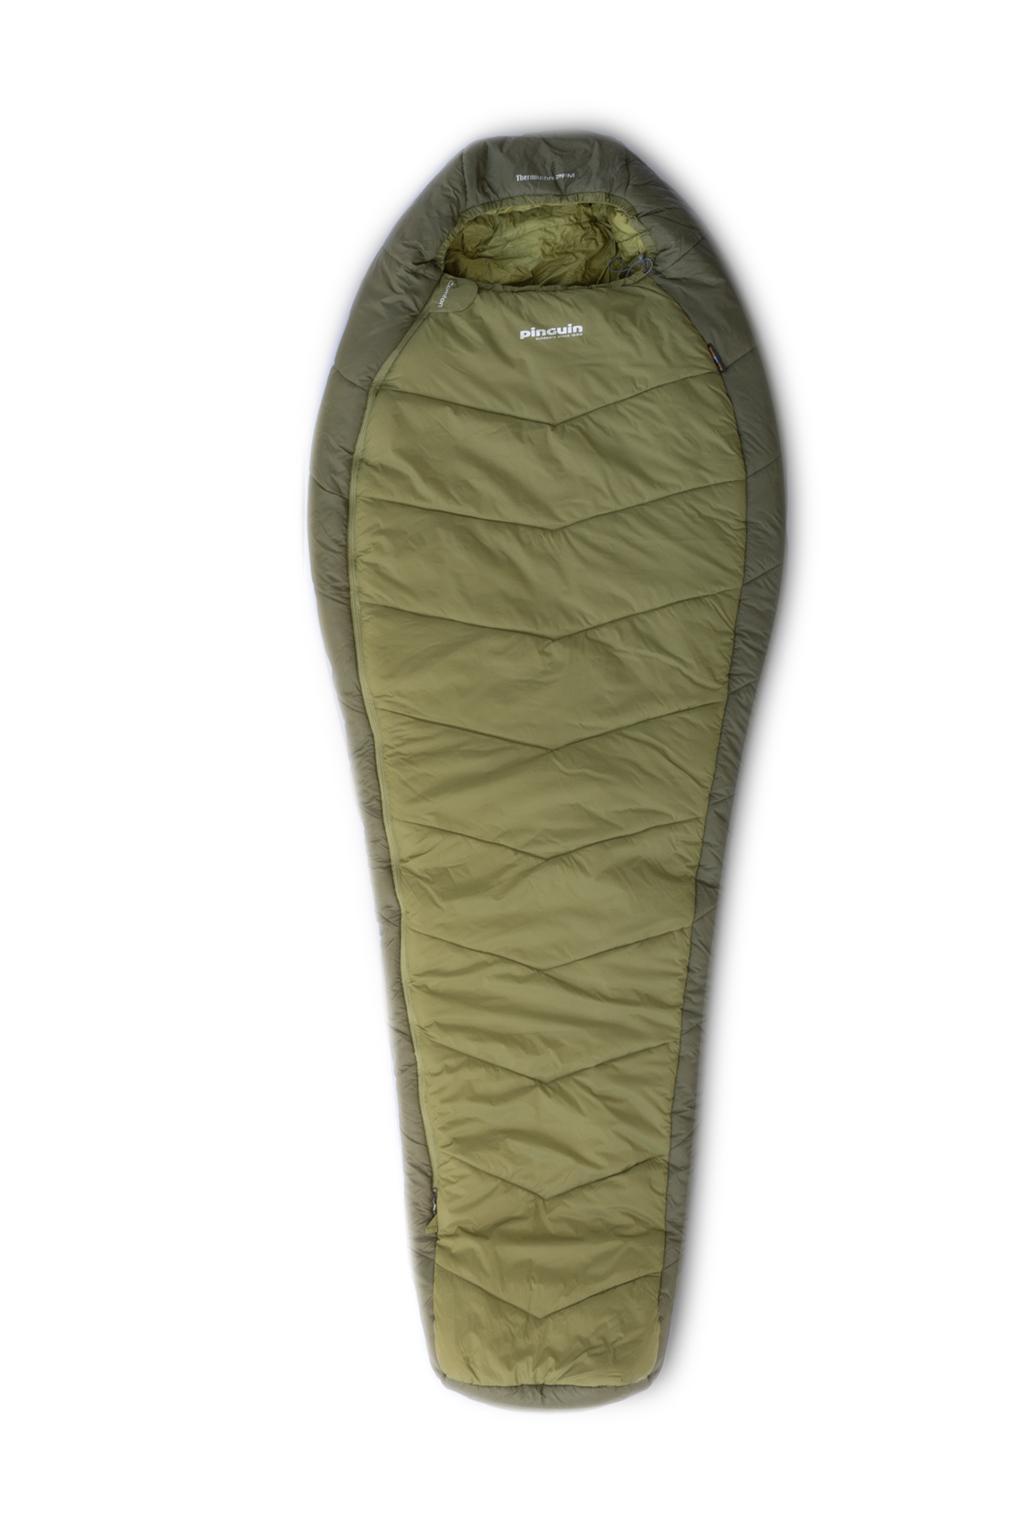 Mumiový spacák Comfort khaki